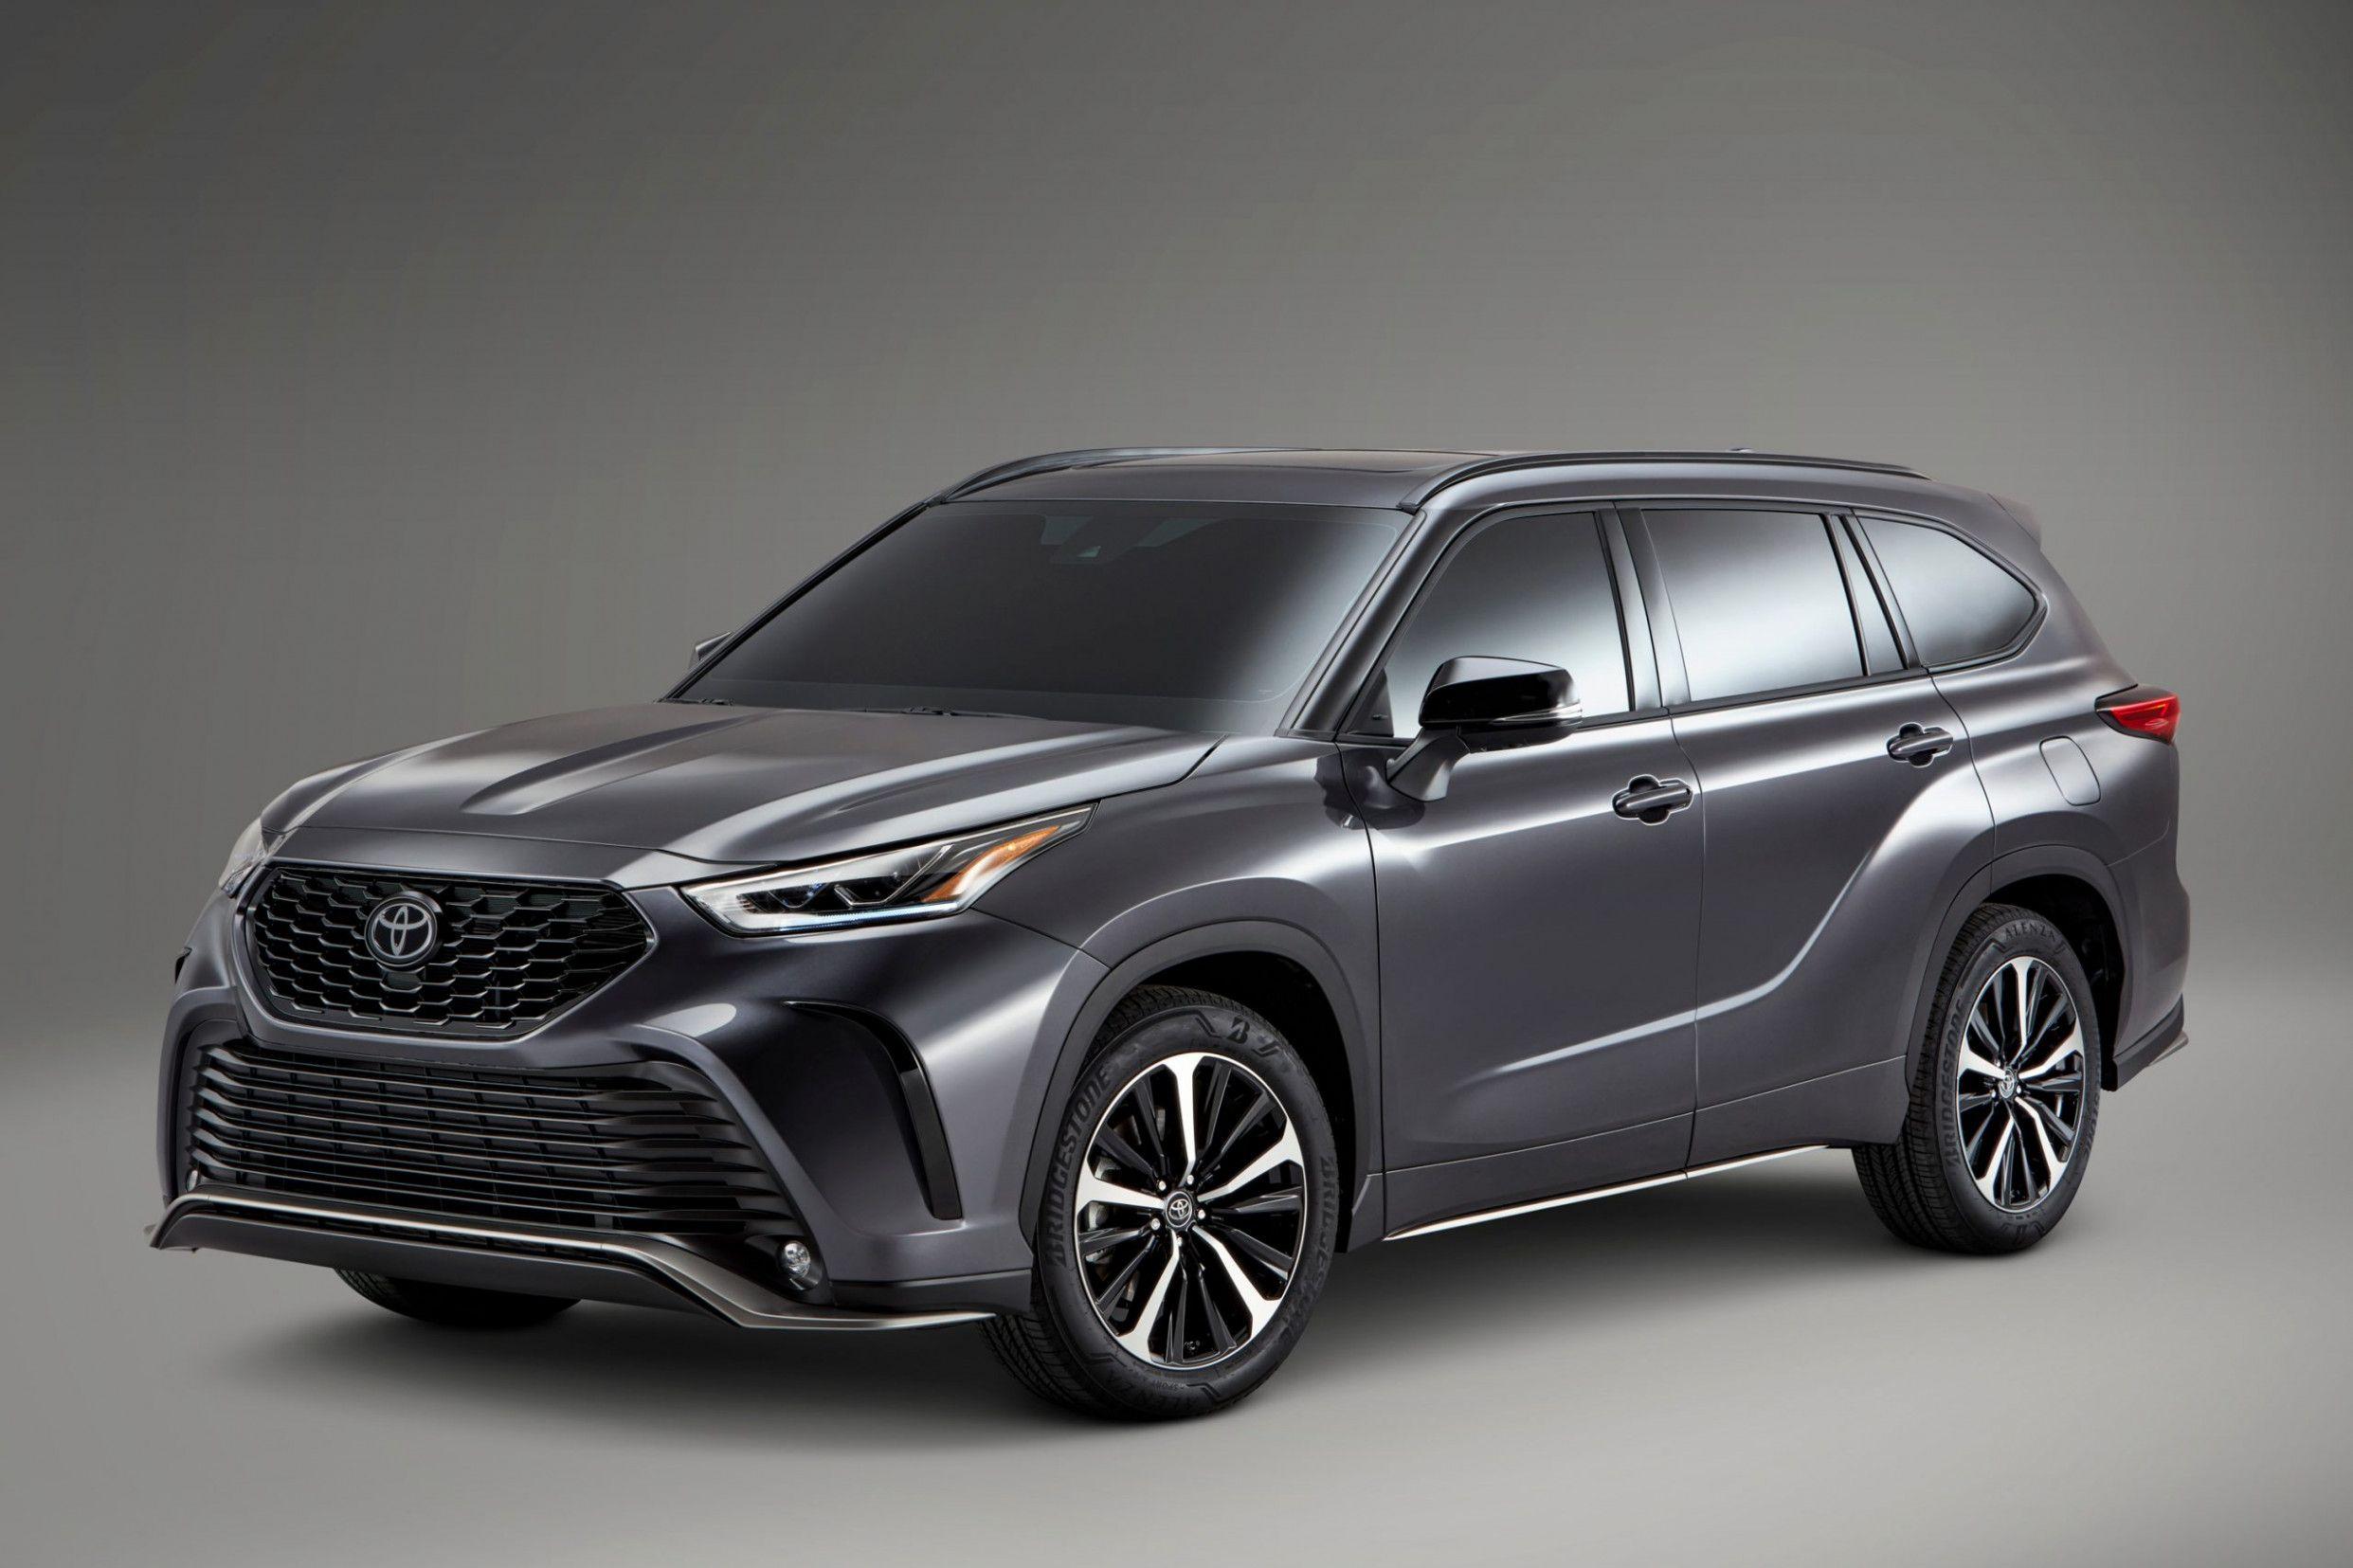 Konzept Und Konzept 2021 Toyota Matrix In 2020 Toyota Highlander Interior Toyota Highlander Toyota